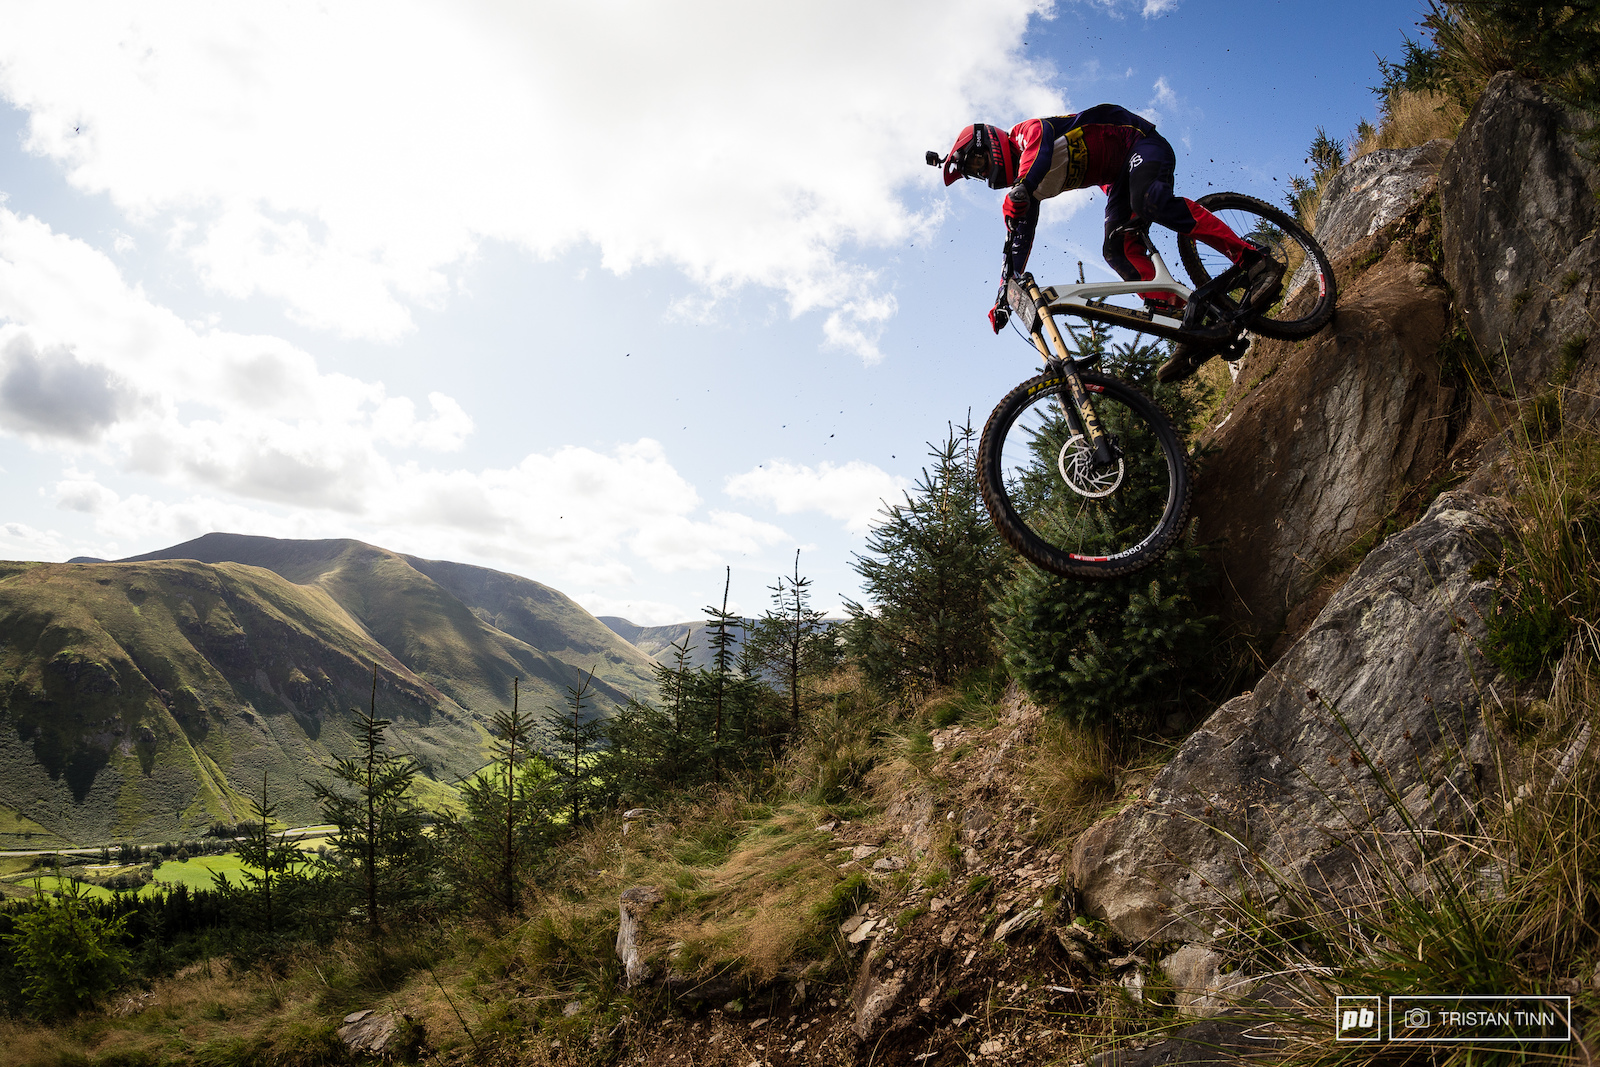 Harry Molloy tackles the nadgery rock drop up top